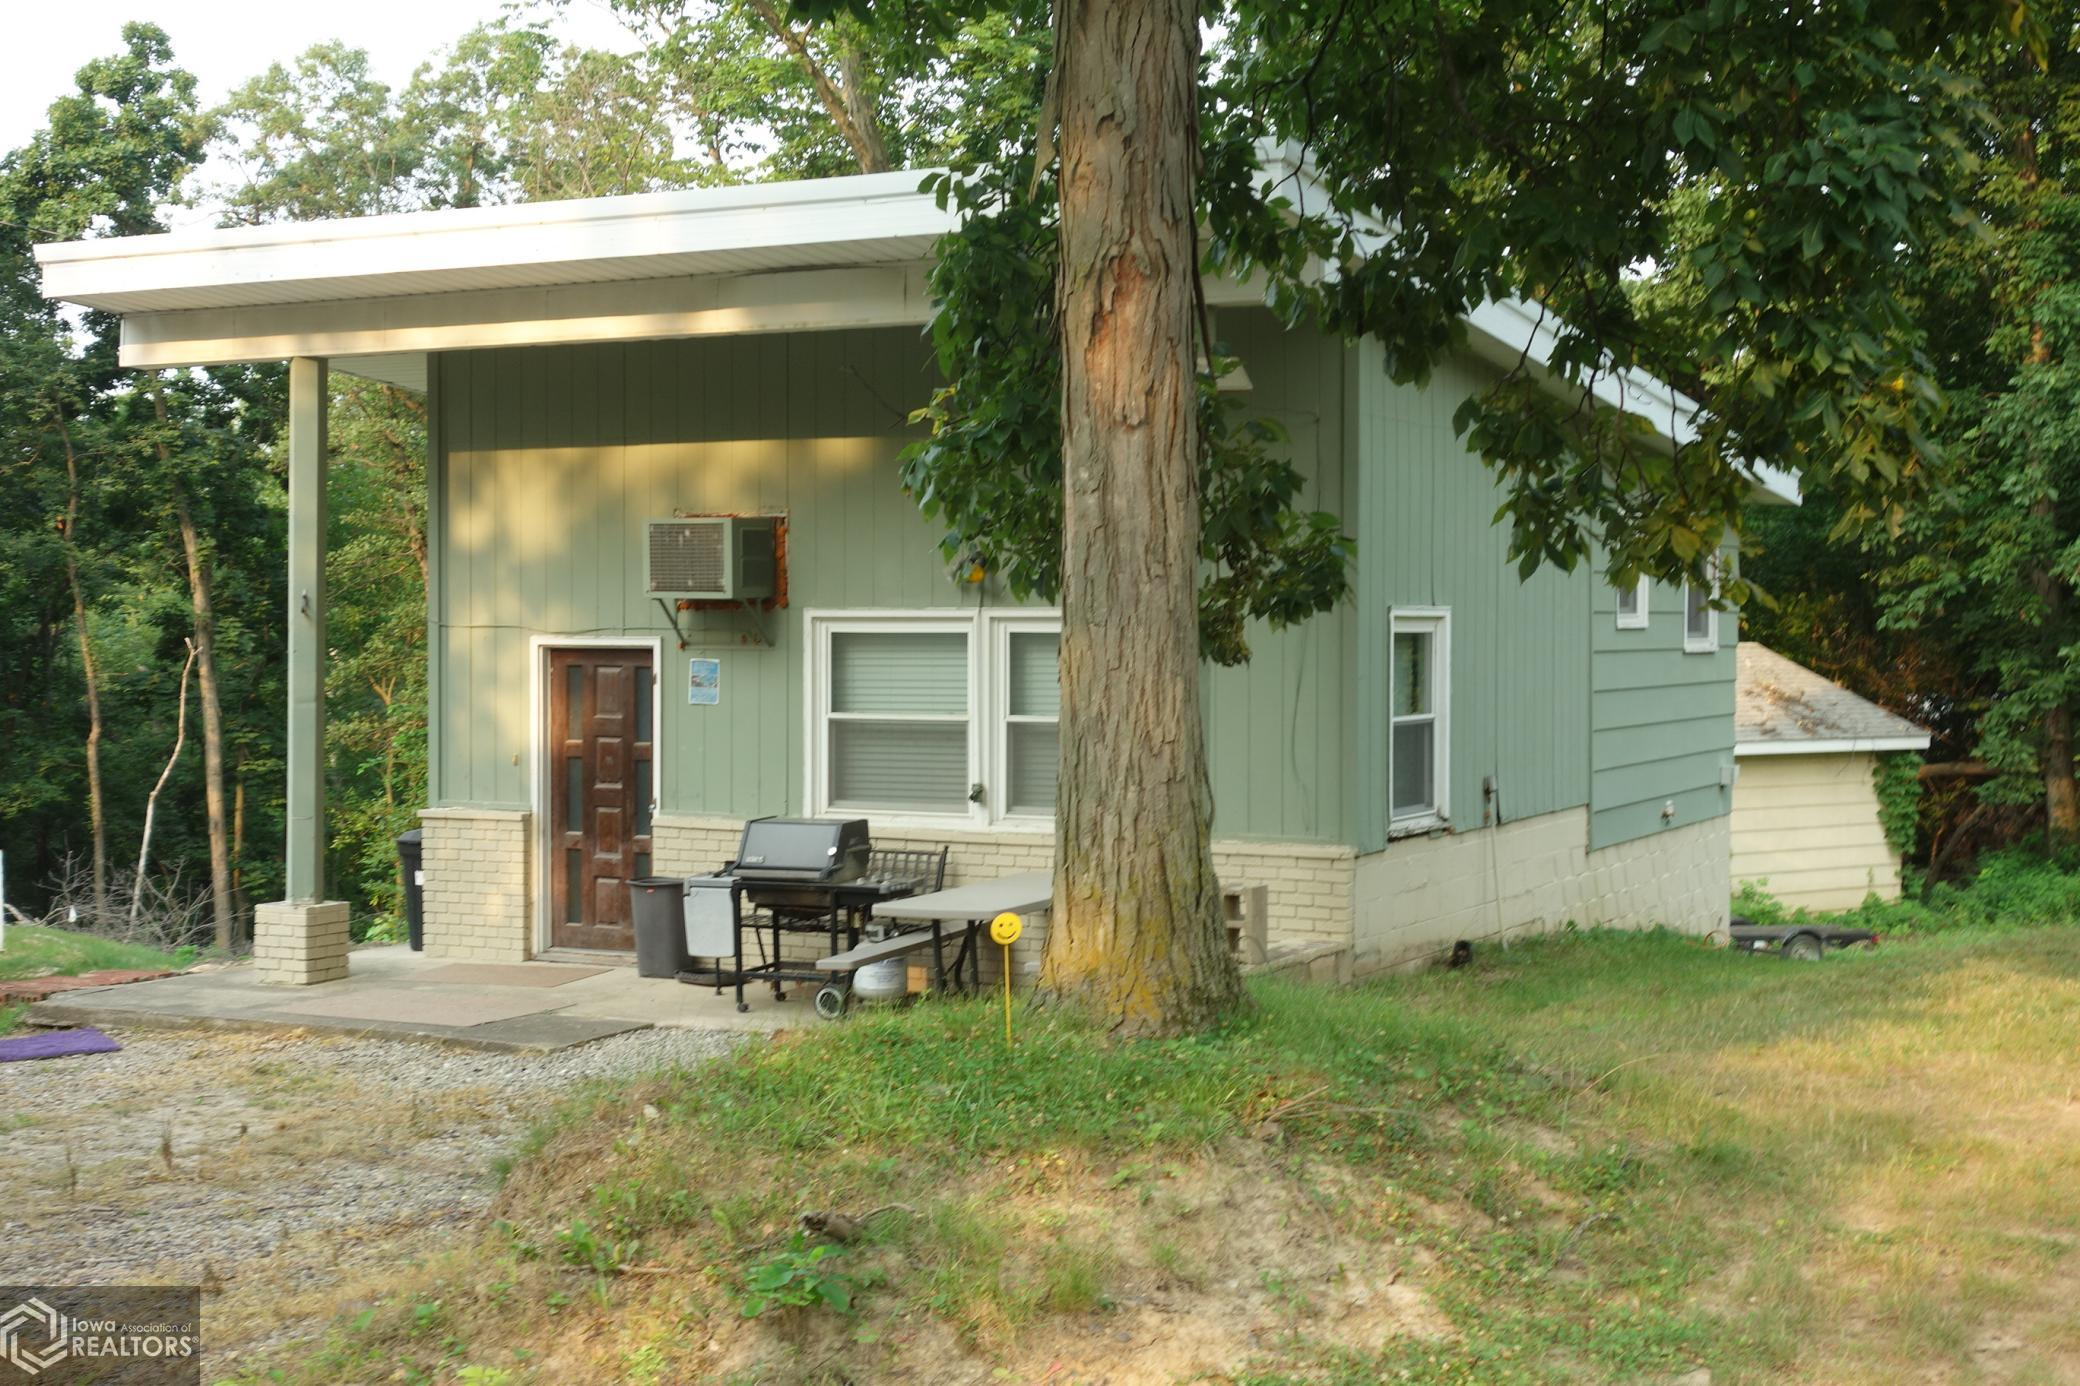 4165 Sharon, Brooklyn, Iowa 52211-9784, 3 Bedrooms Bedrooms, ,1 BathroomBathrooms,Single Family,For Sale,Sharon,6071278